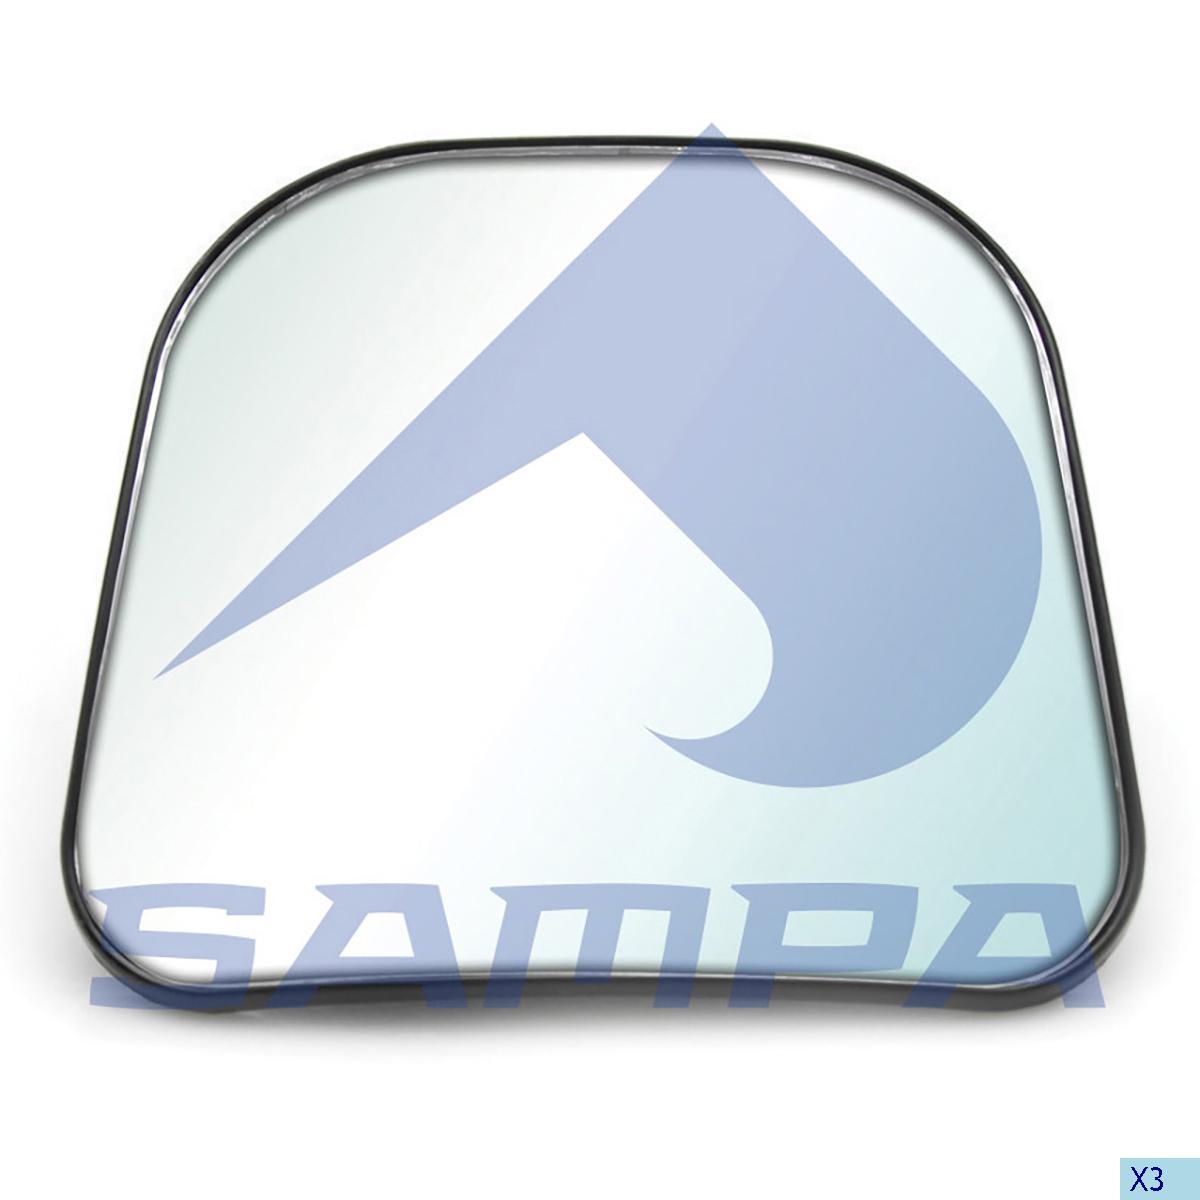 Mirror Glass, Scania, Cab